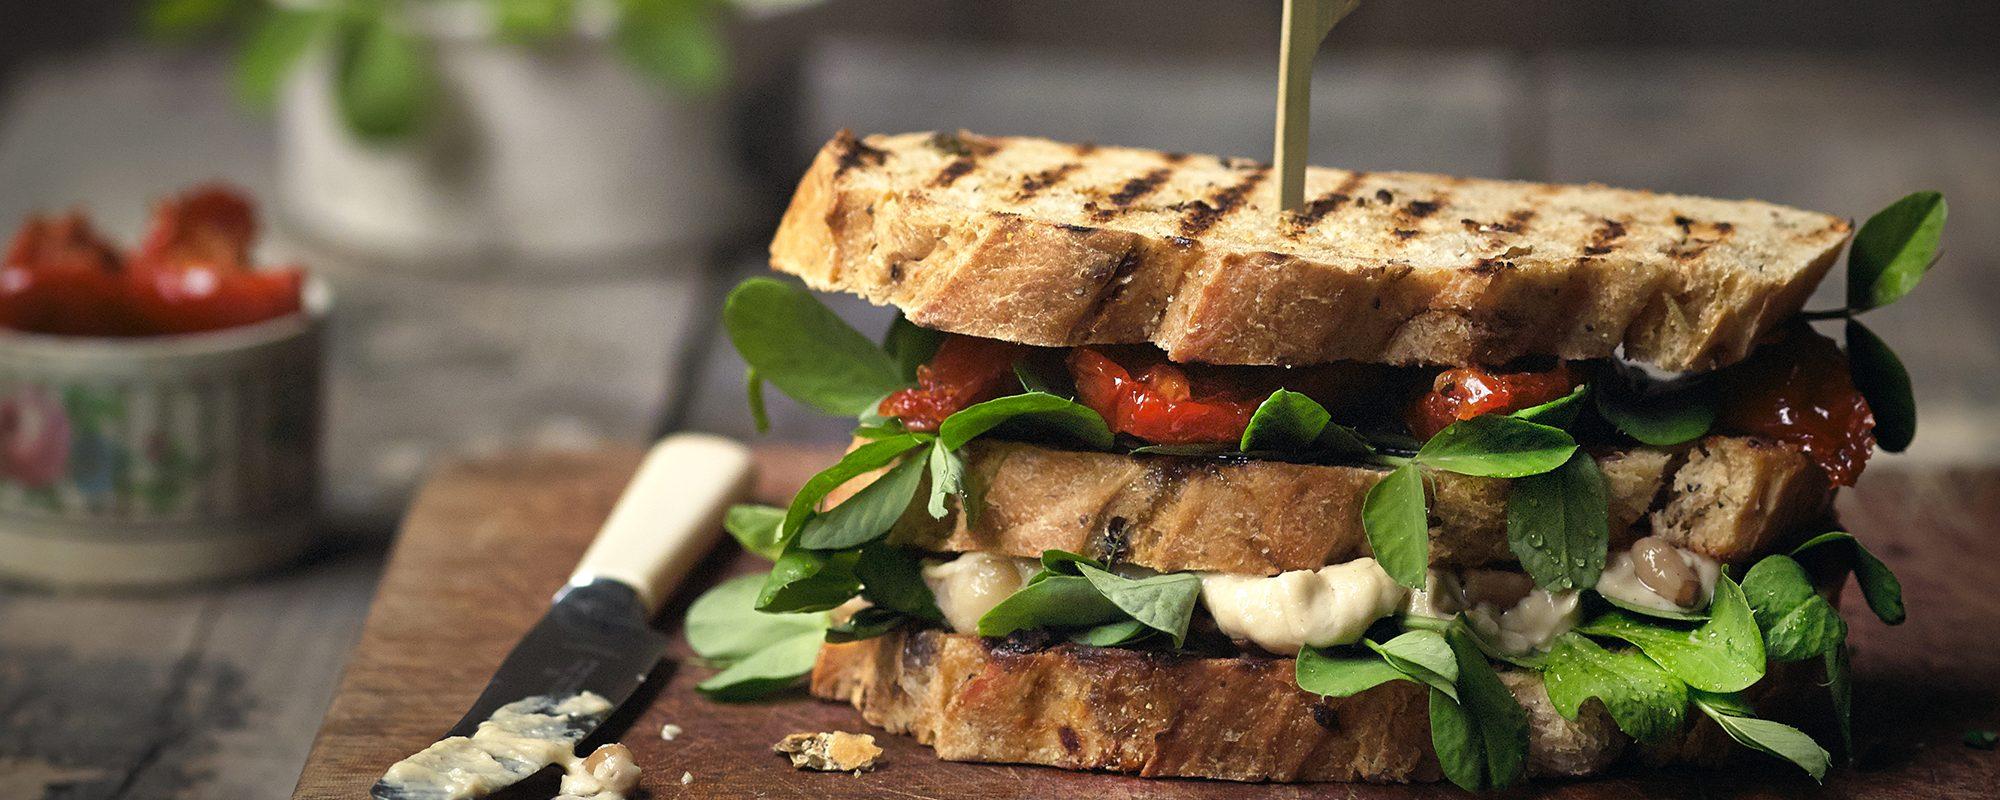 Sundried tomato, houmous and pea shoots sandwich